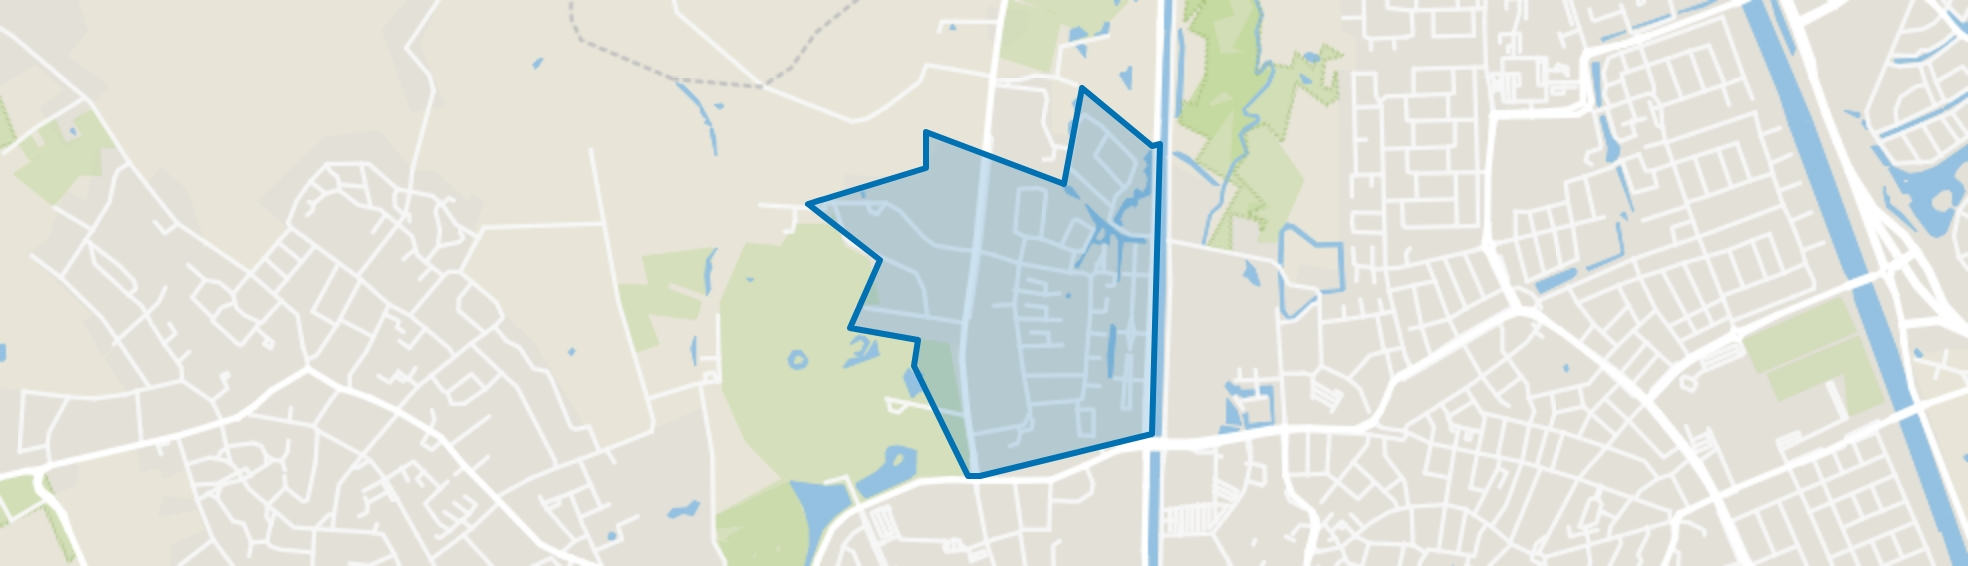 Zwanenbeemd, Helmond map